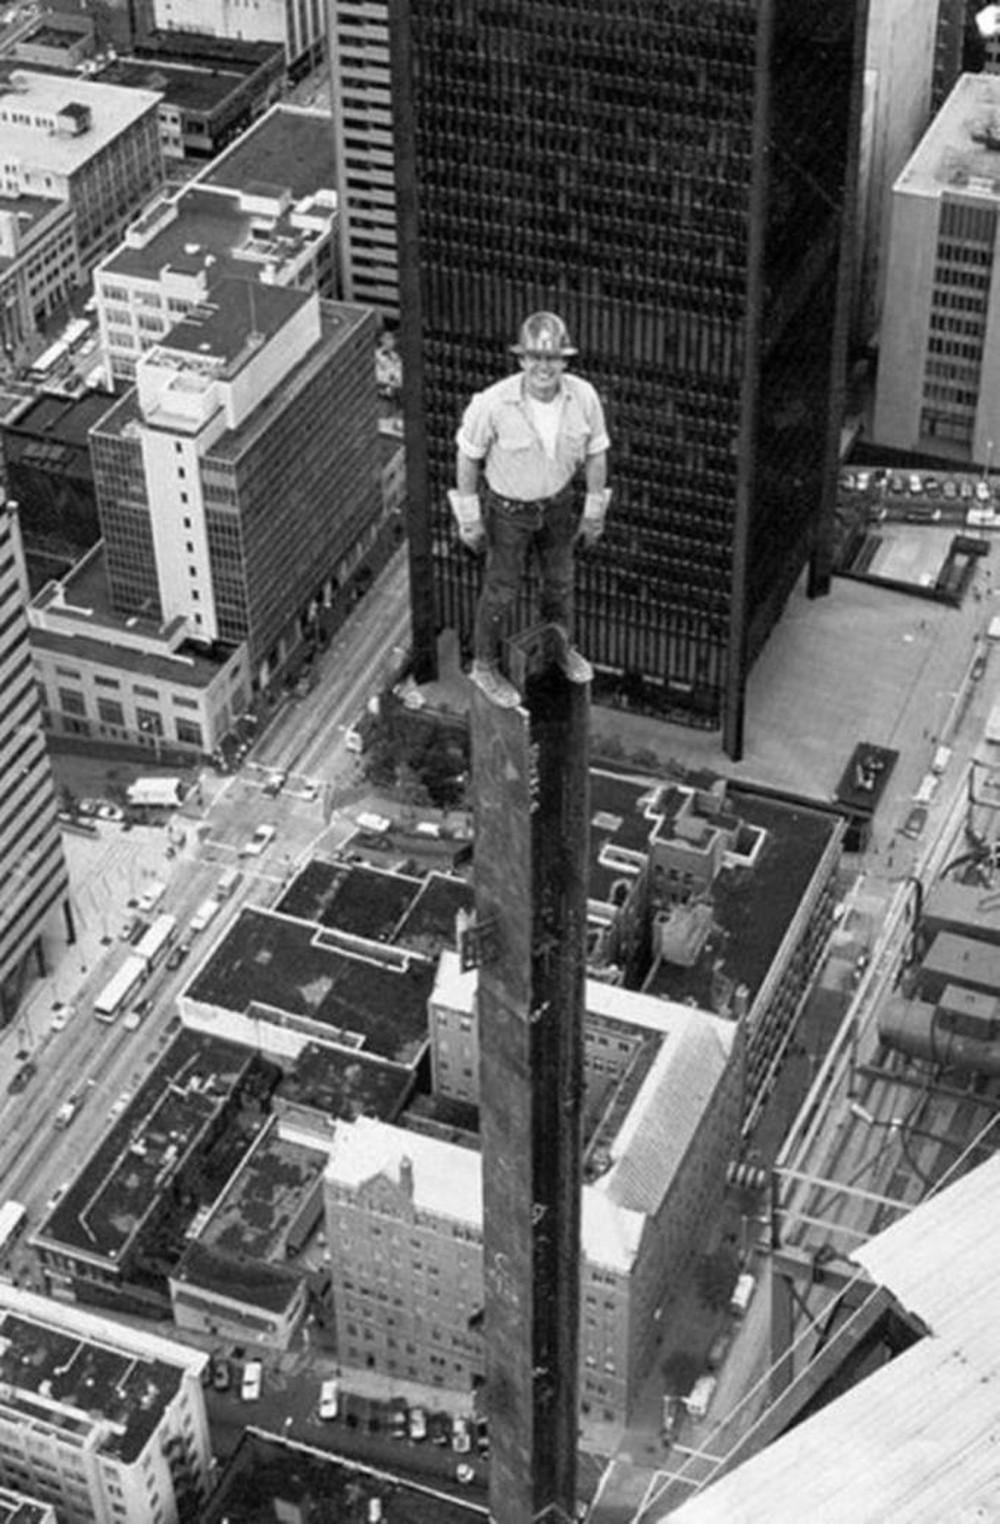 Construction worker, Seattle, 1980